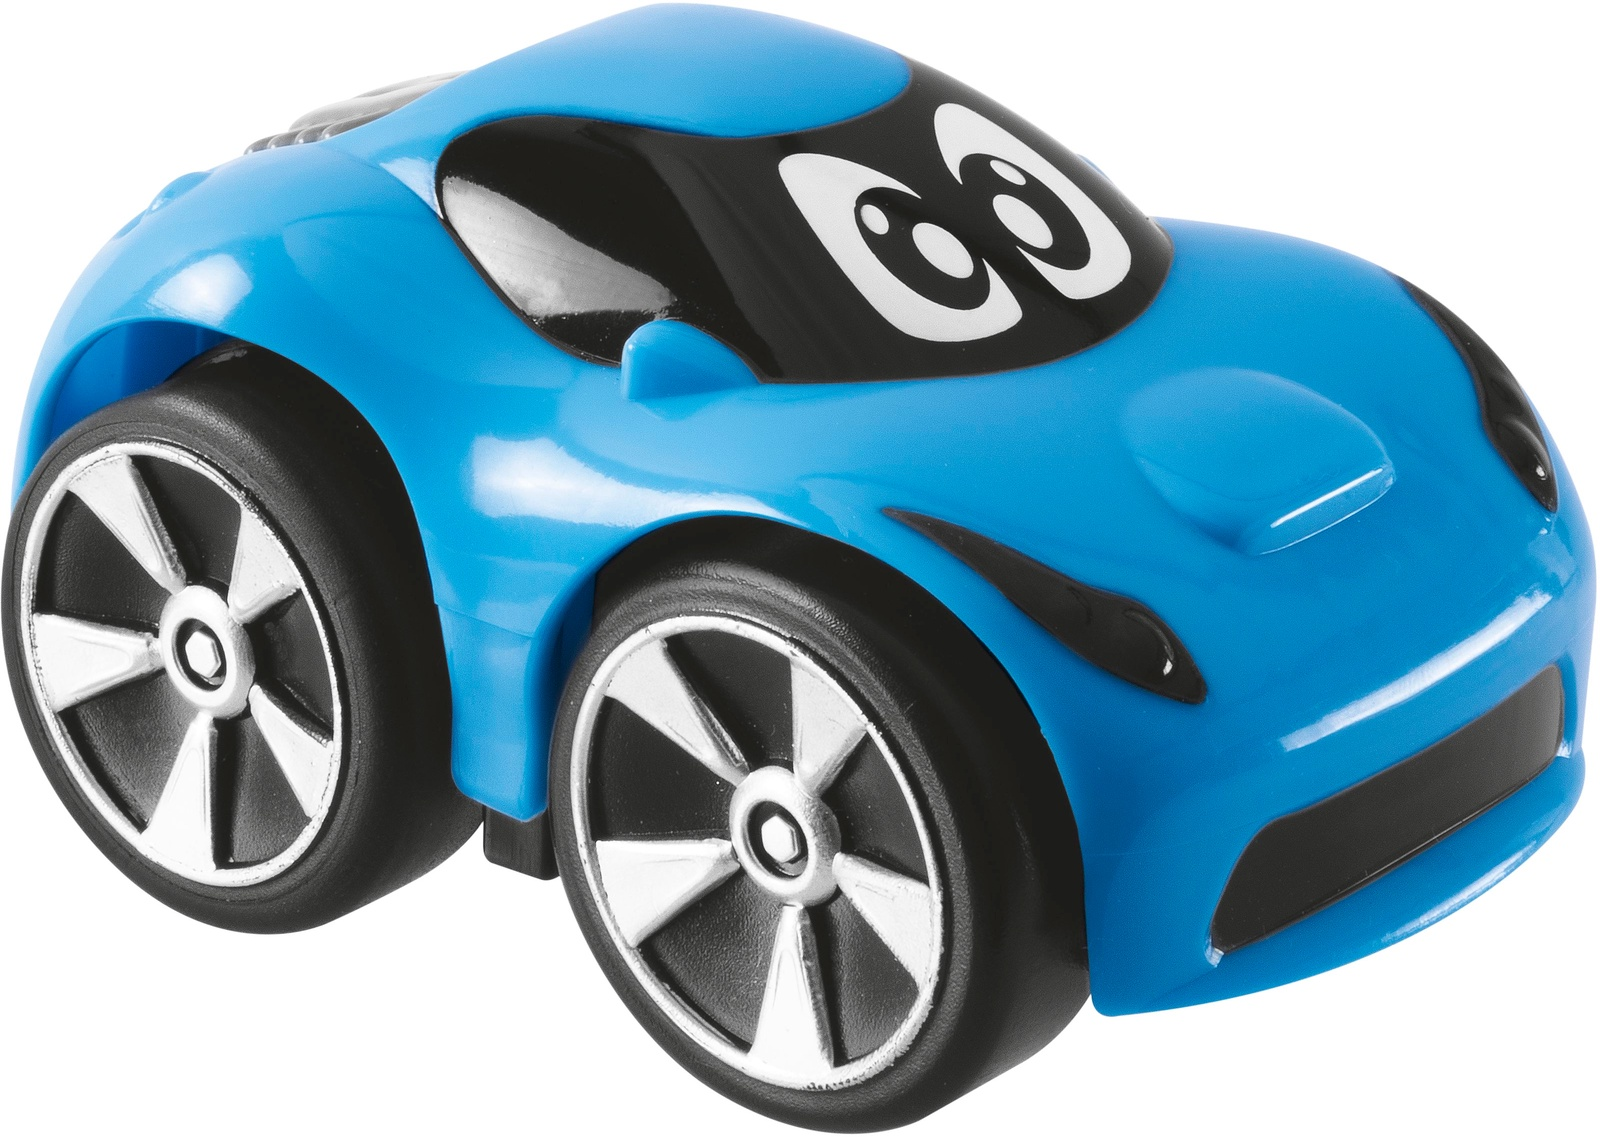 Машинка-игрушка Chicco Turbo Touch Bond синий цена